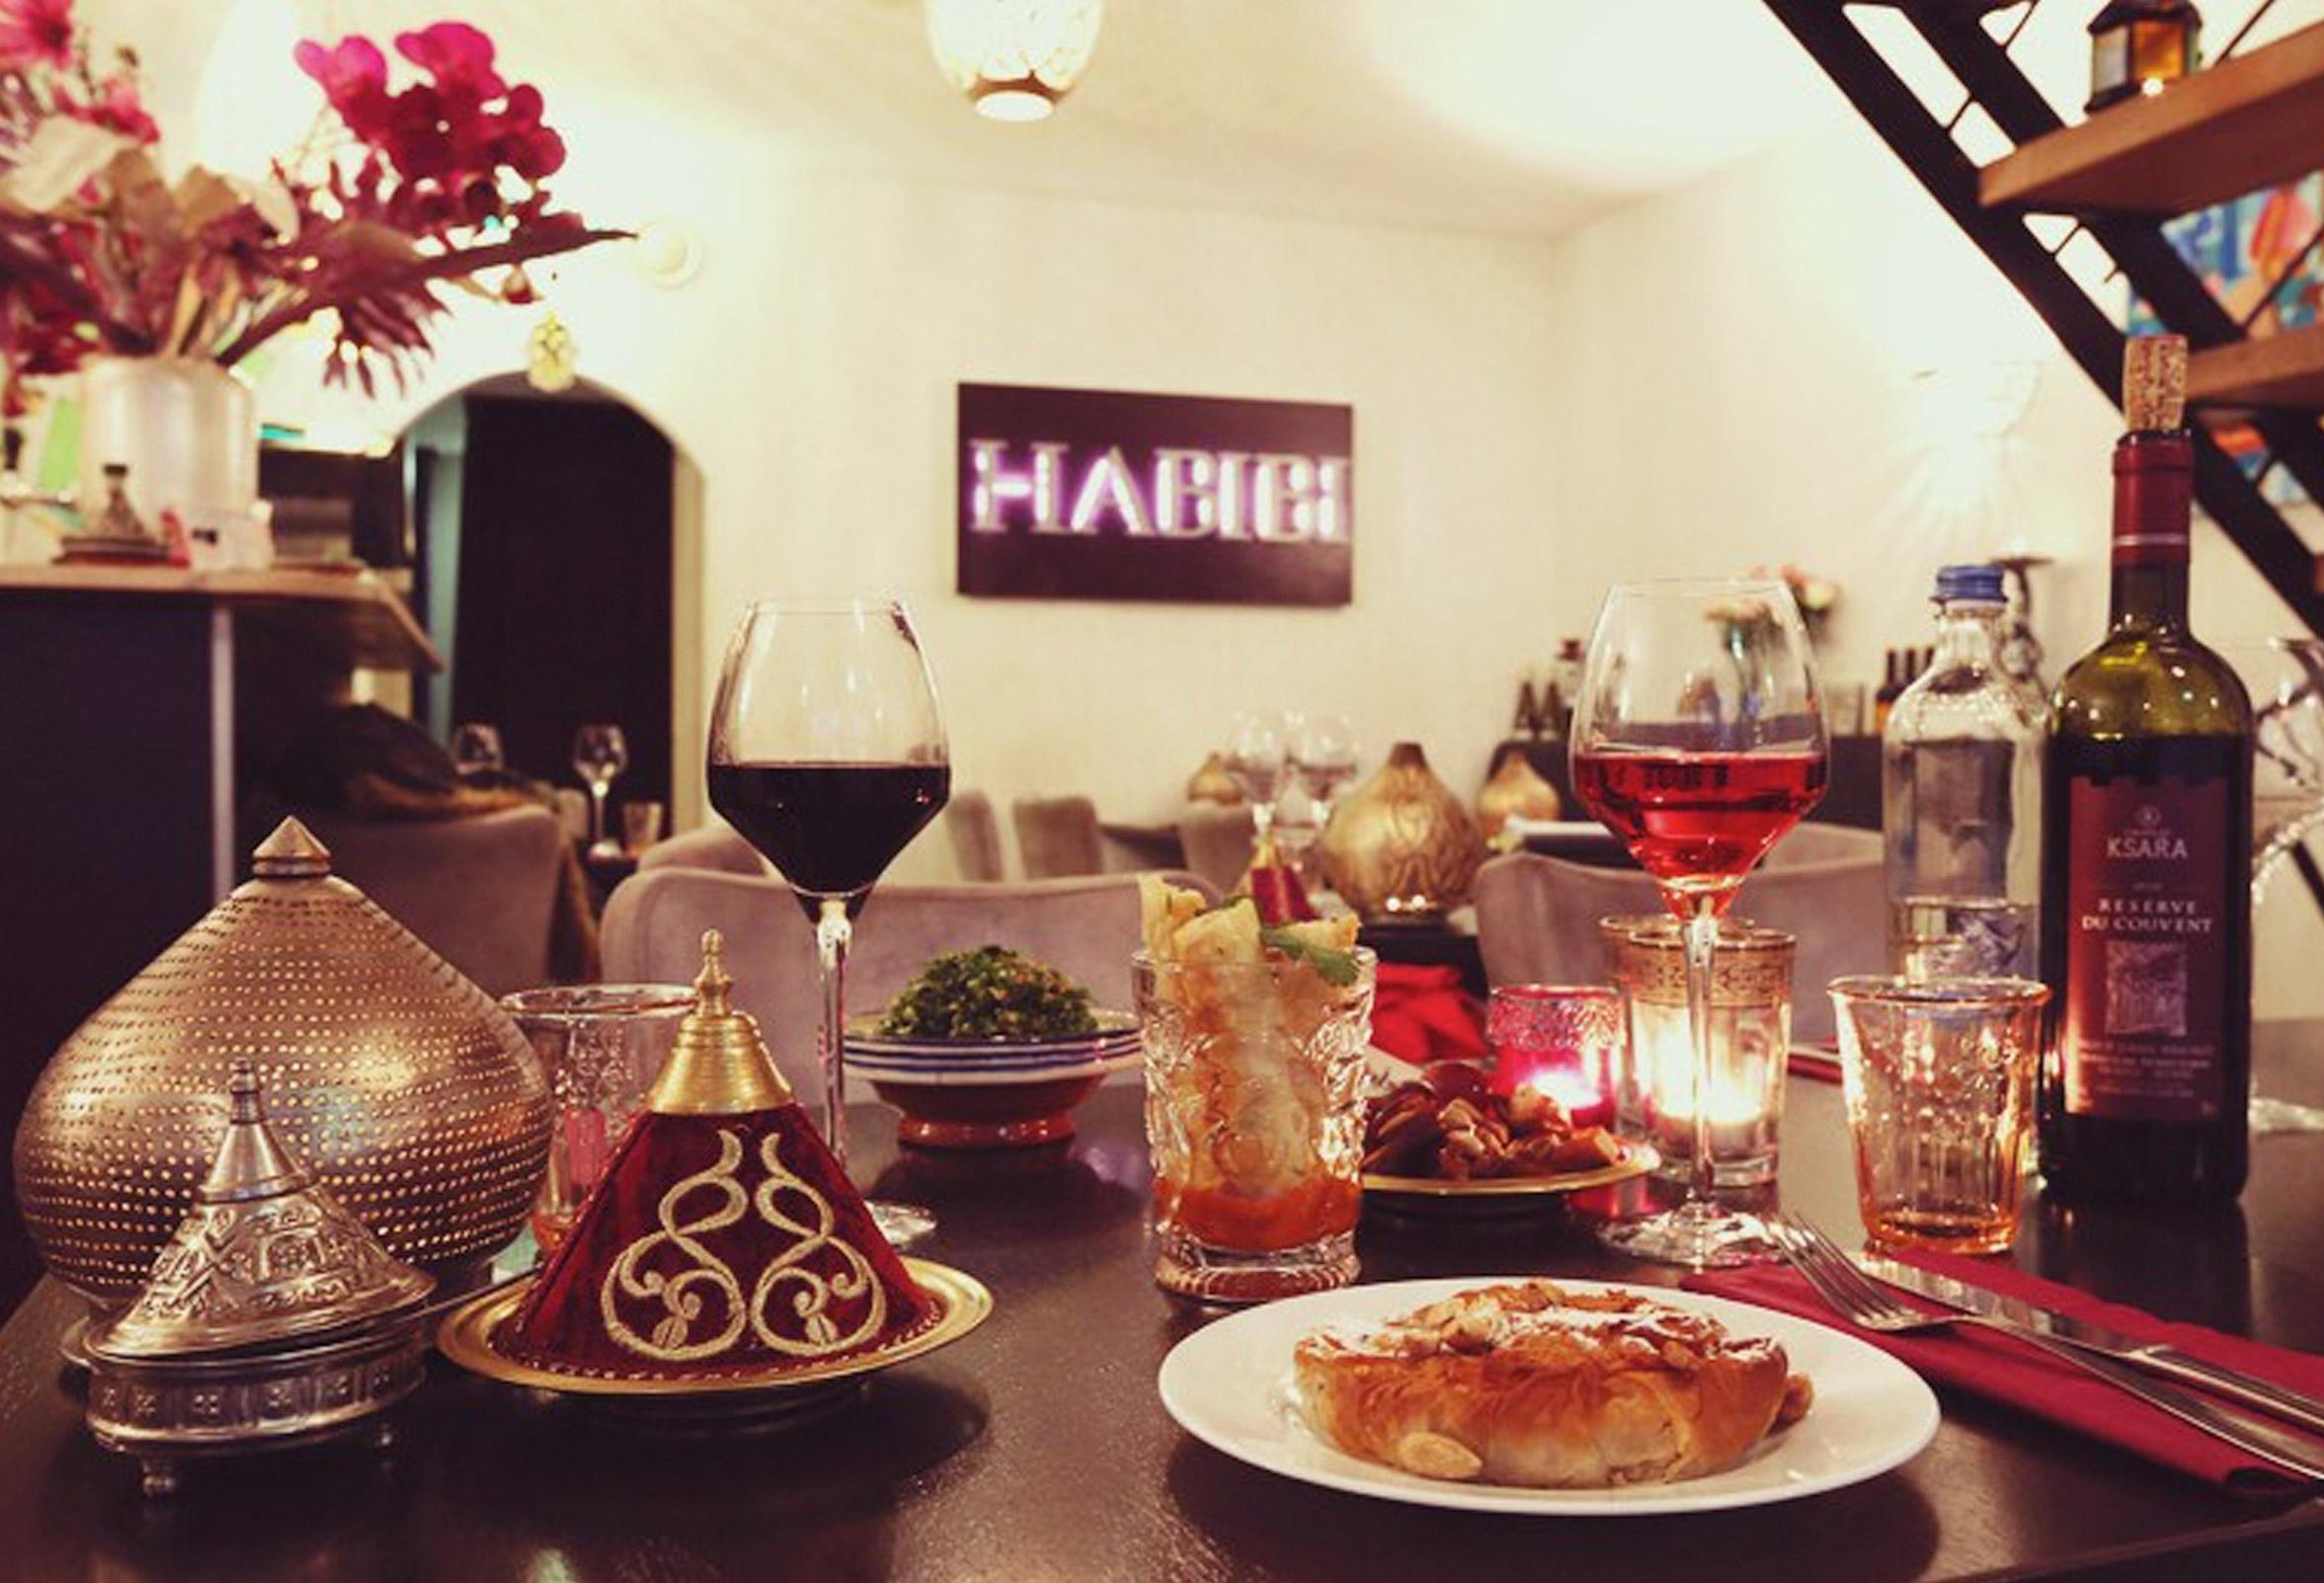 Restaurant Habibi Amersfoort | Dudes & Dont's